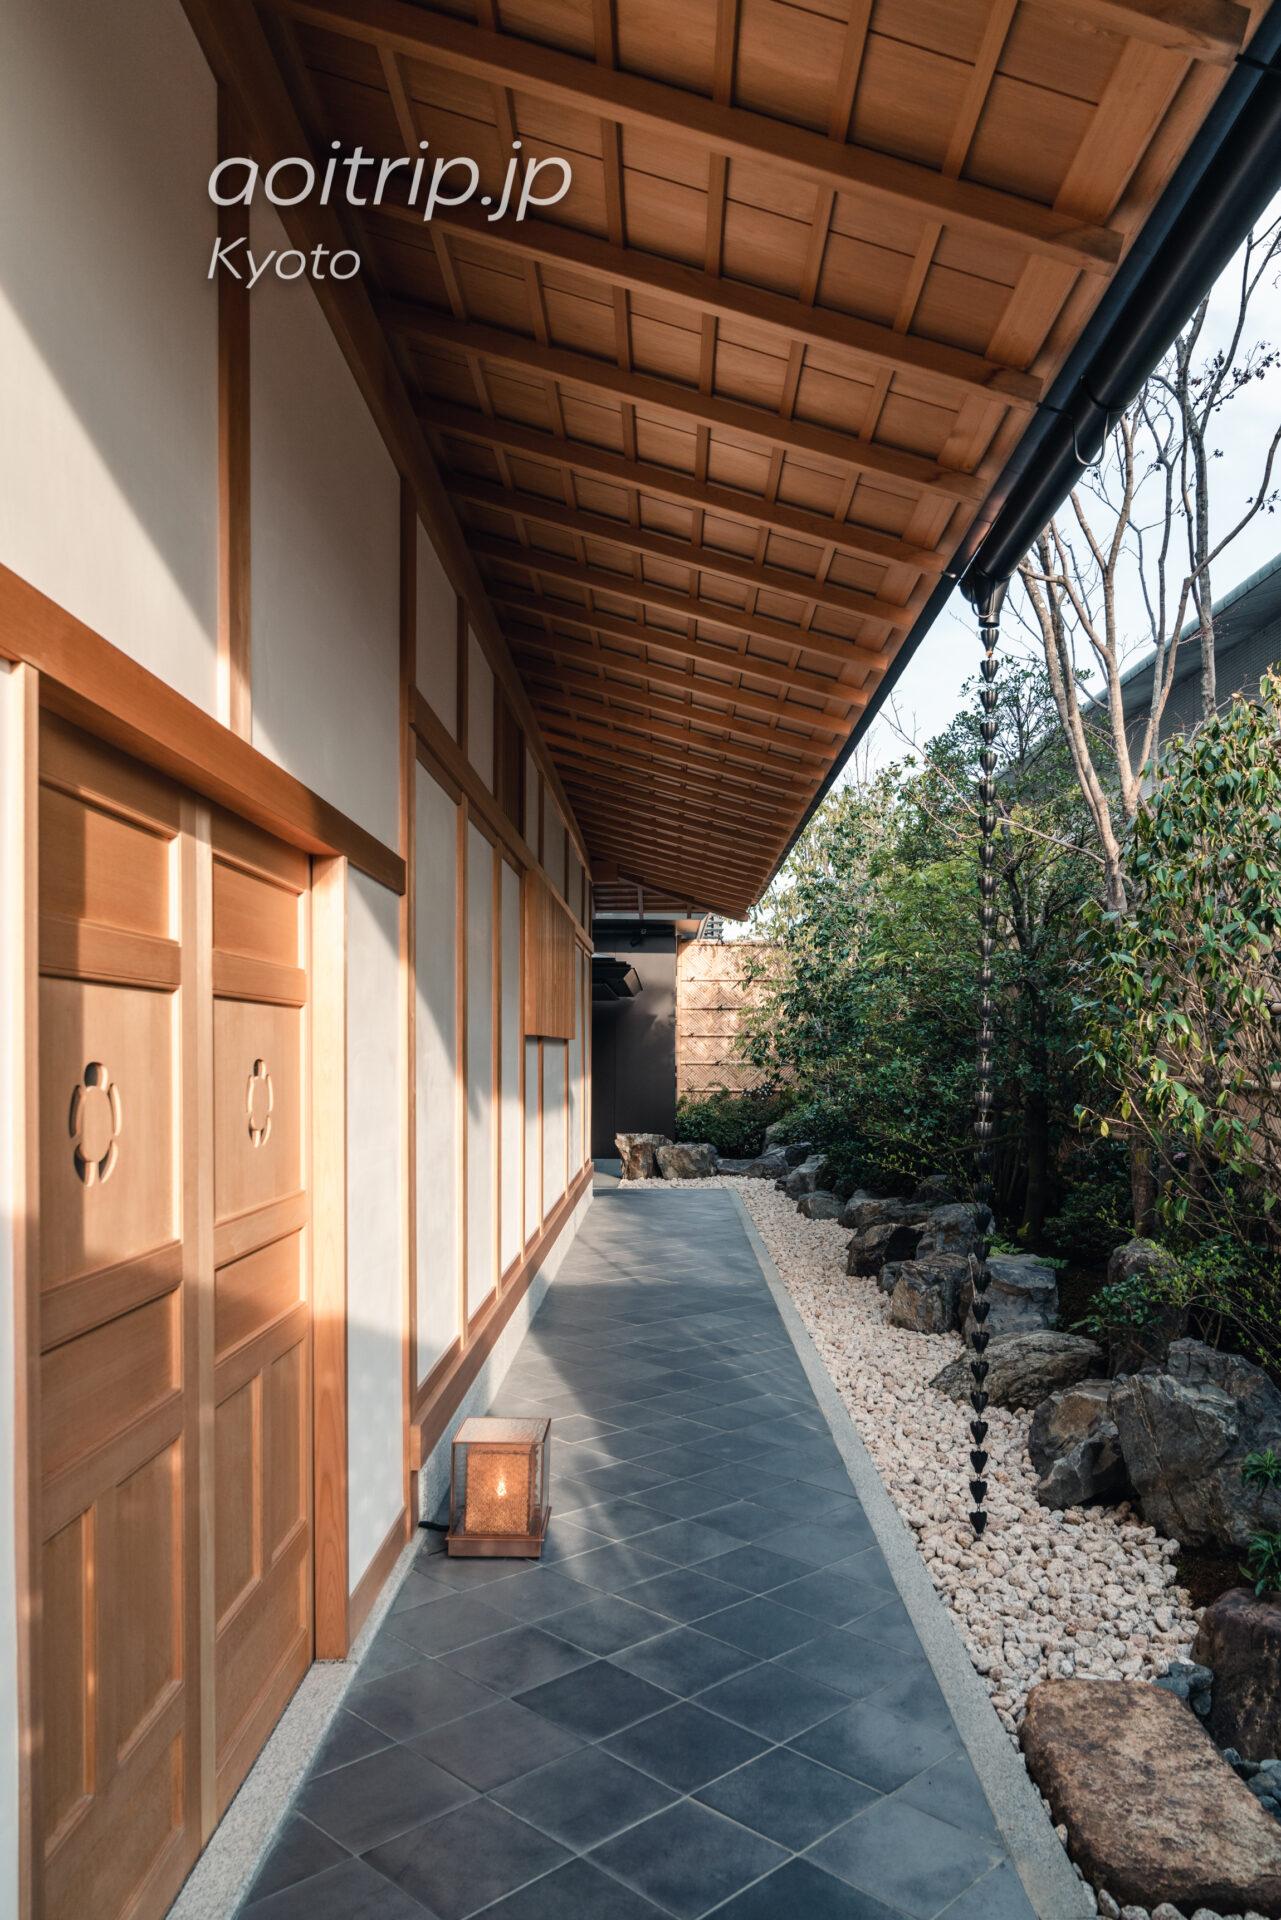 HOTEL THE MITSUI KYOTOの四季の間 Shiki-no-ma